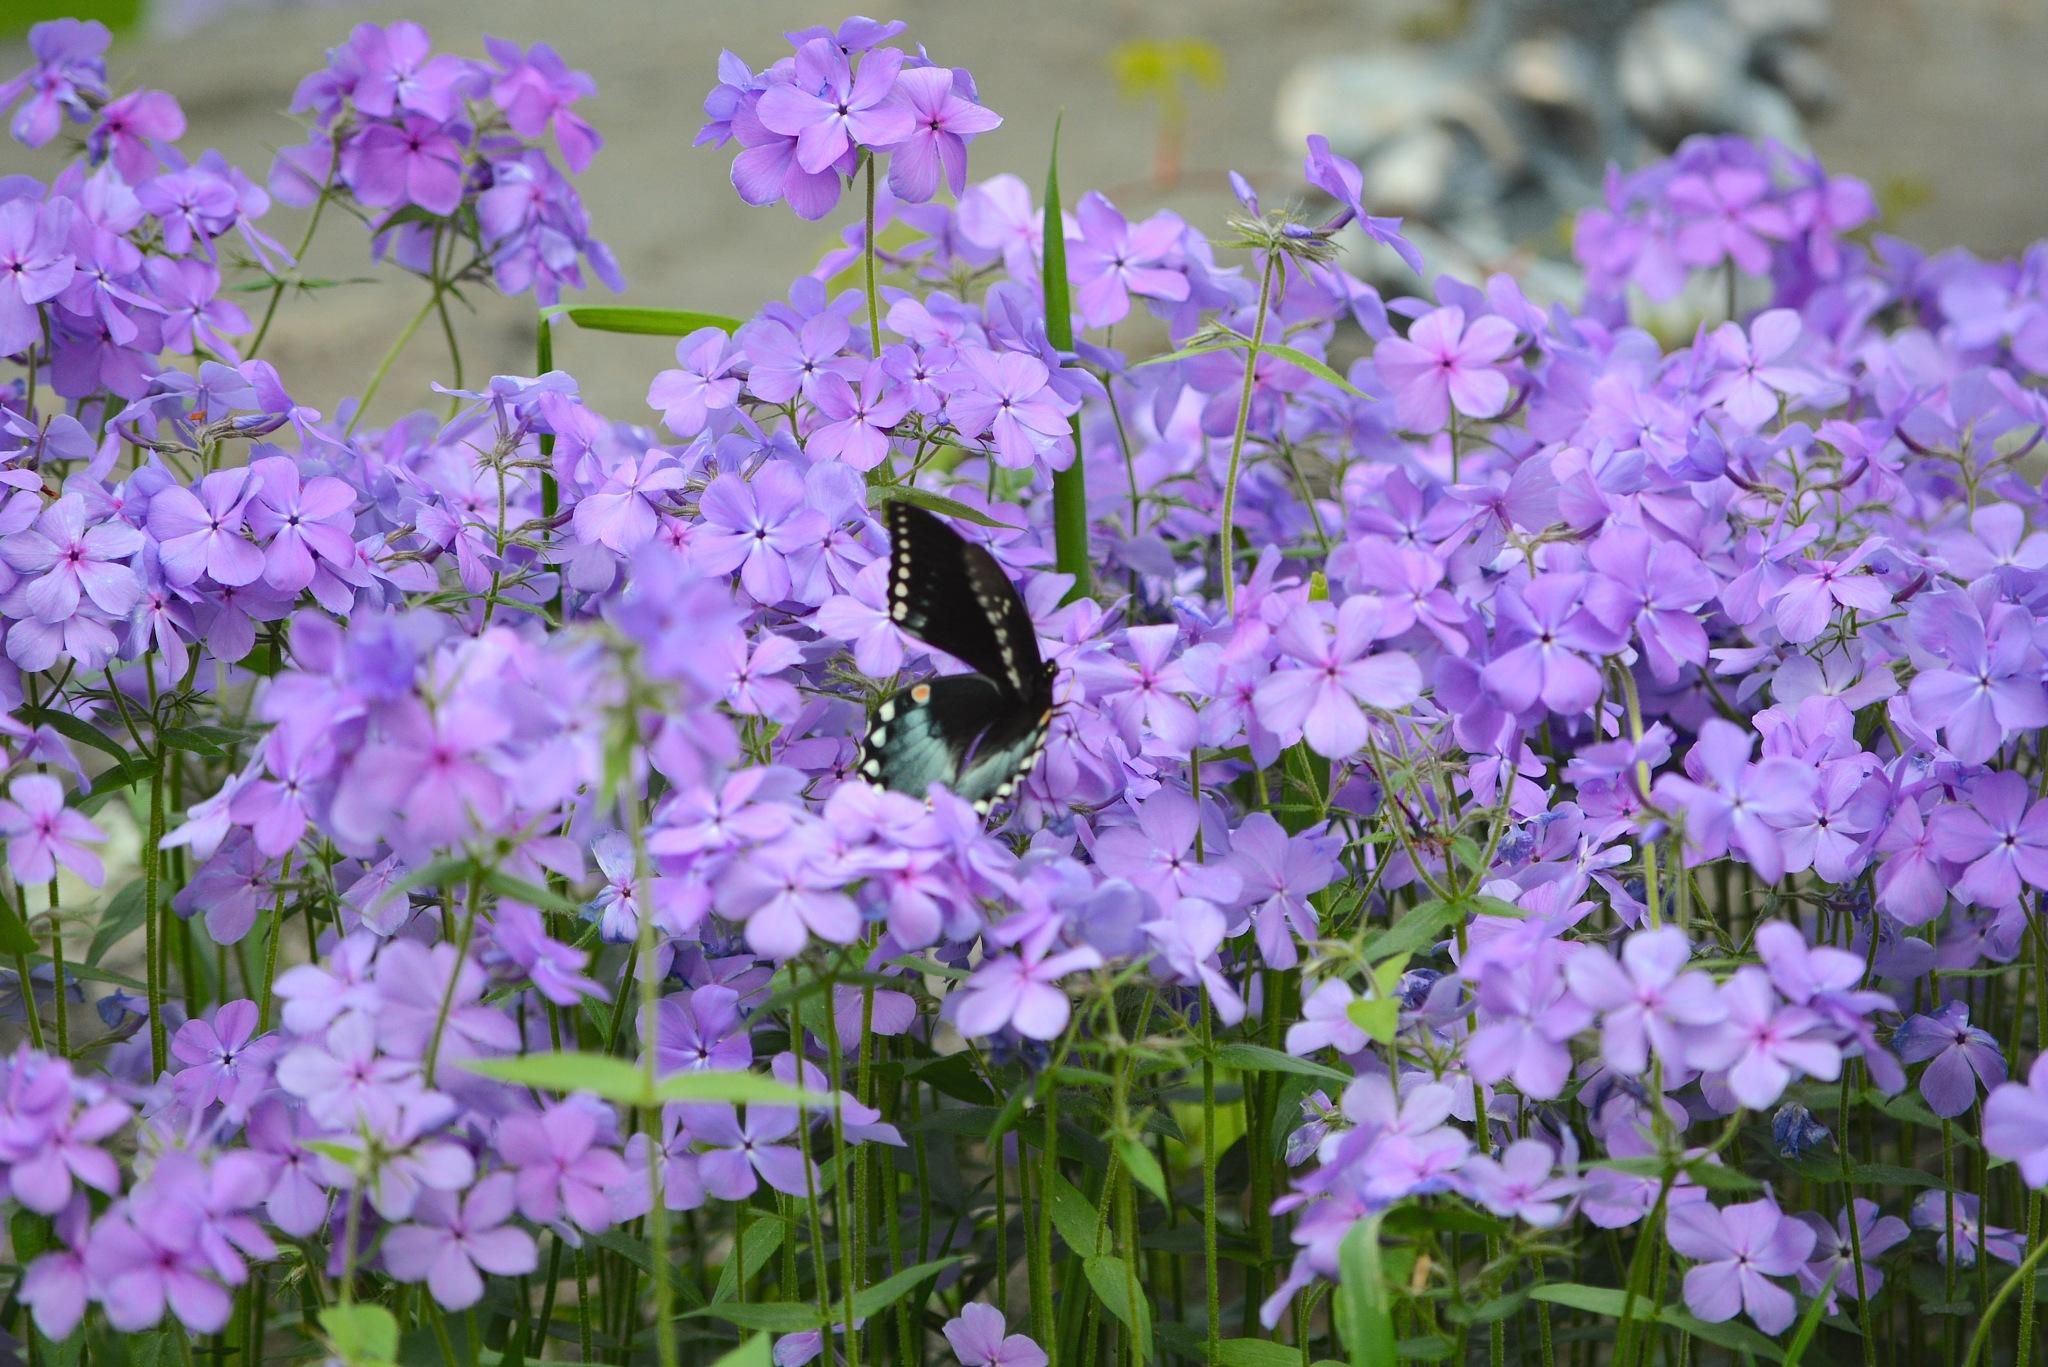 Beauty in the Garden by suzanne.kohr